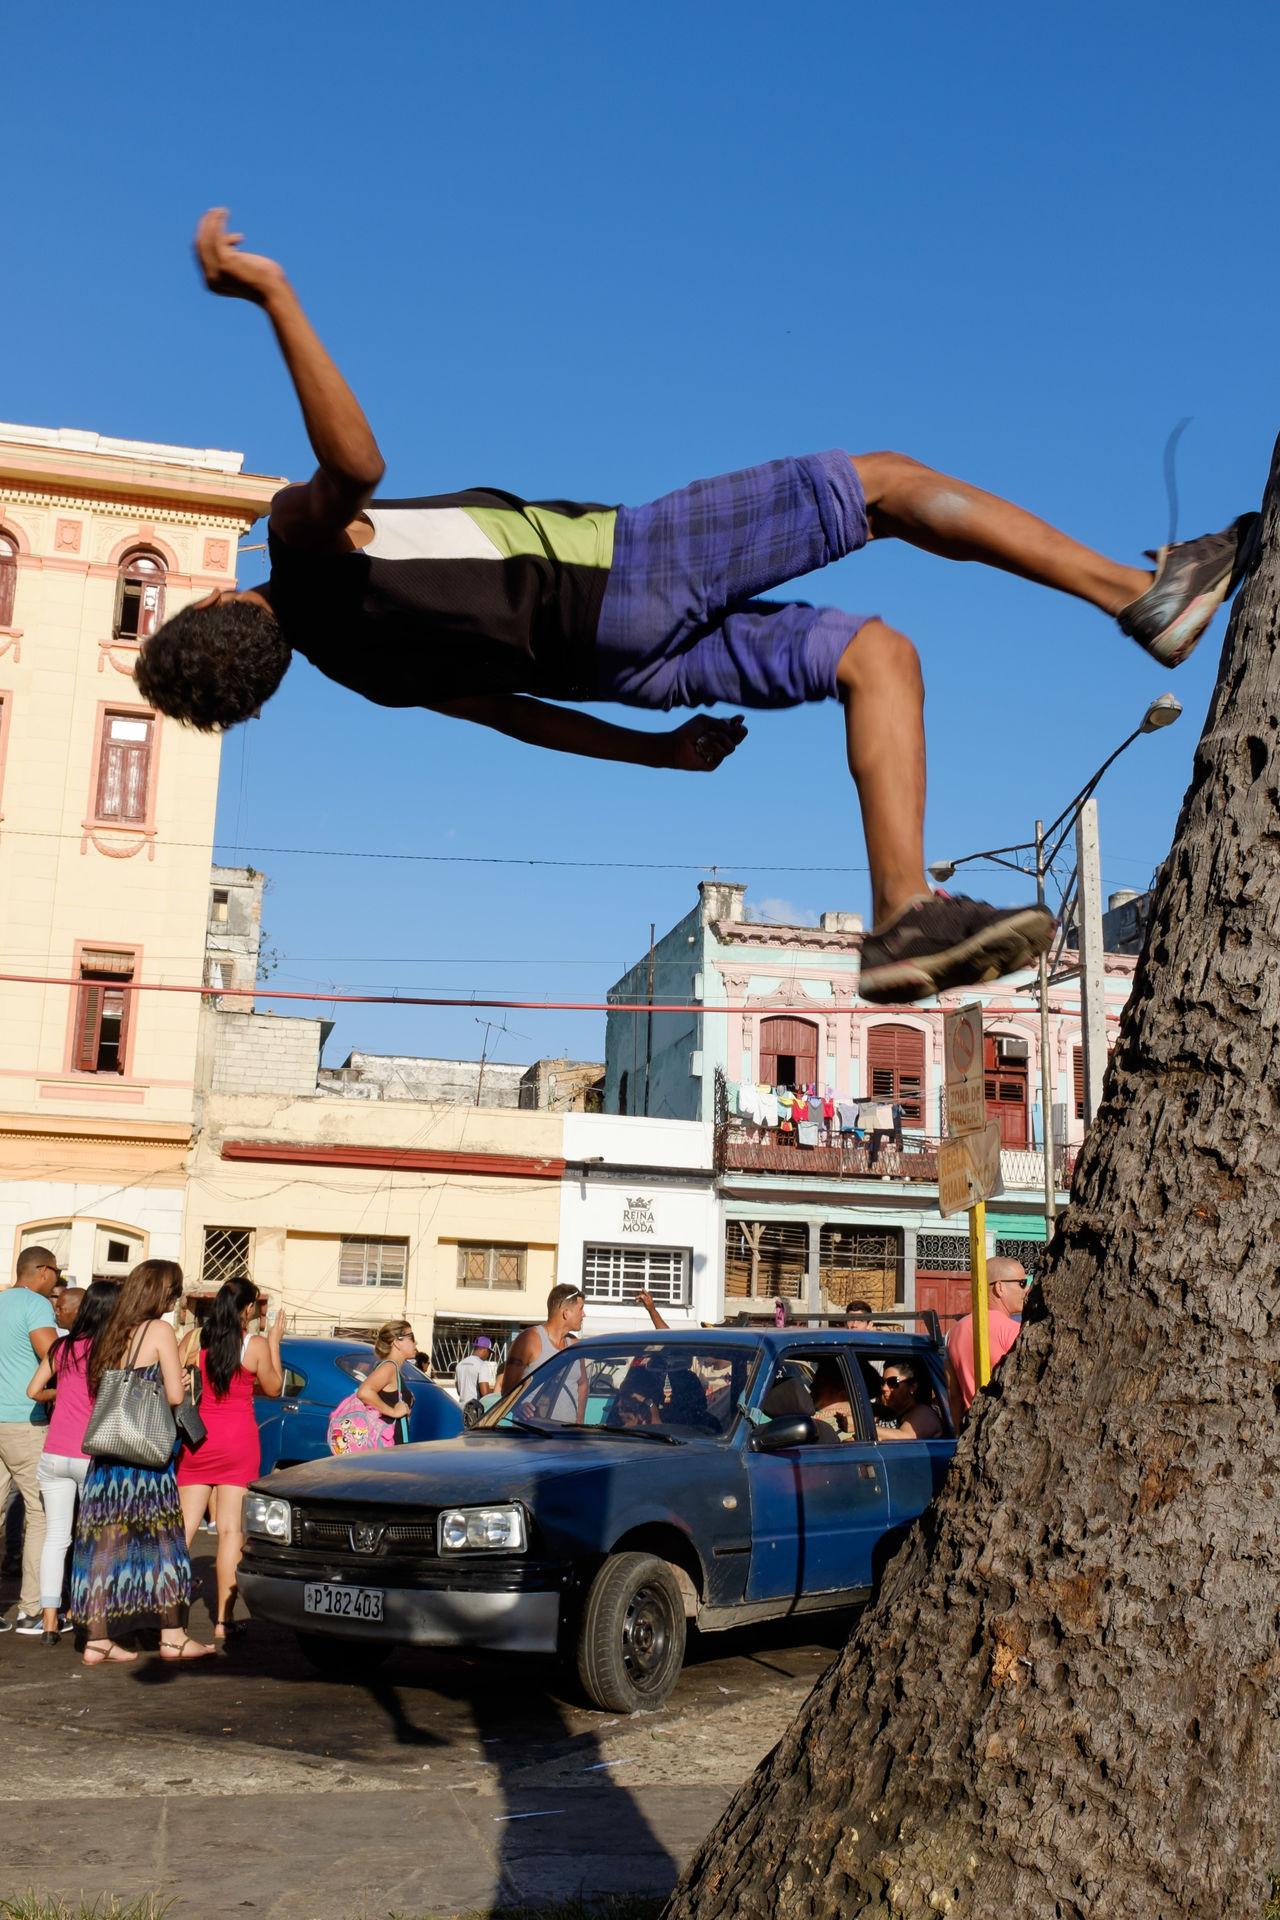 Street Photography Streetphotography Havana Cuba Havana Cuba